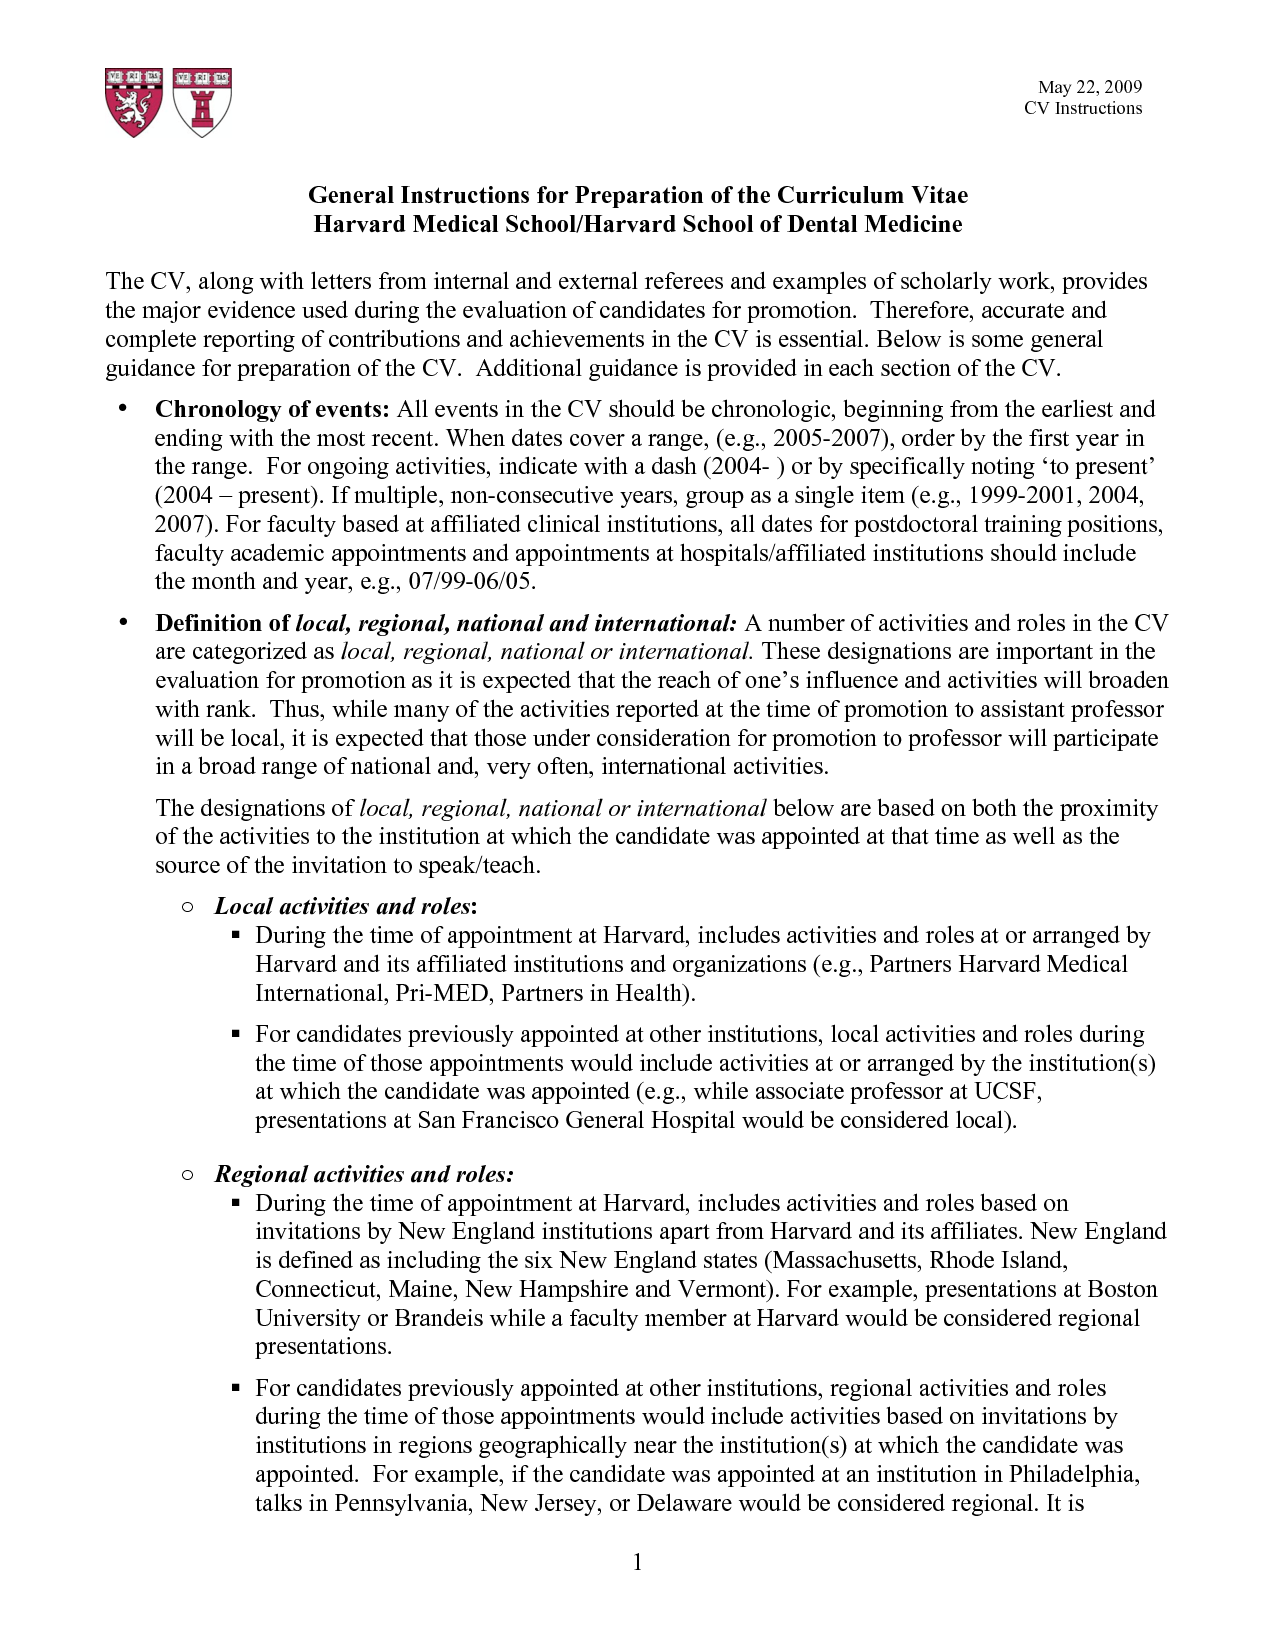 Thick description in ethnographic dissertation